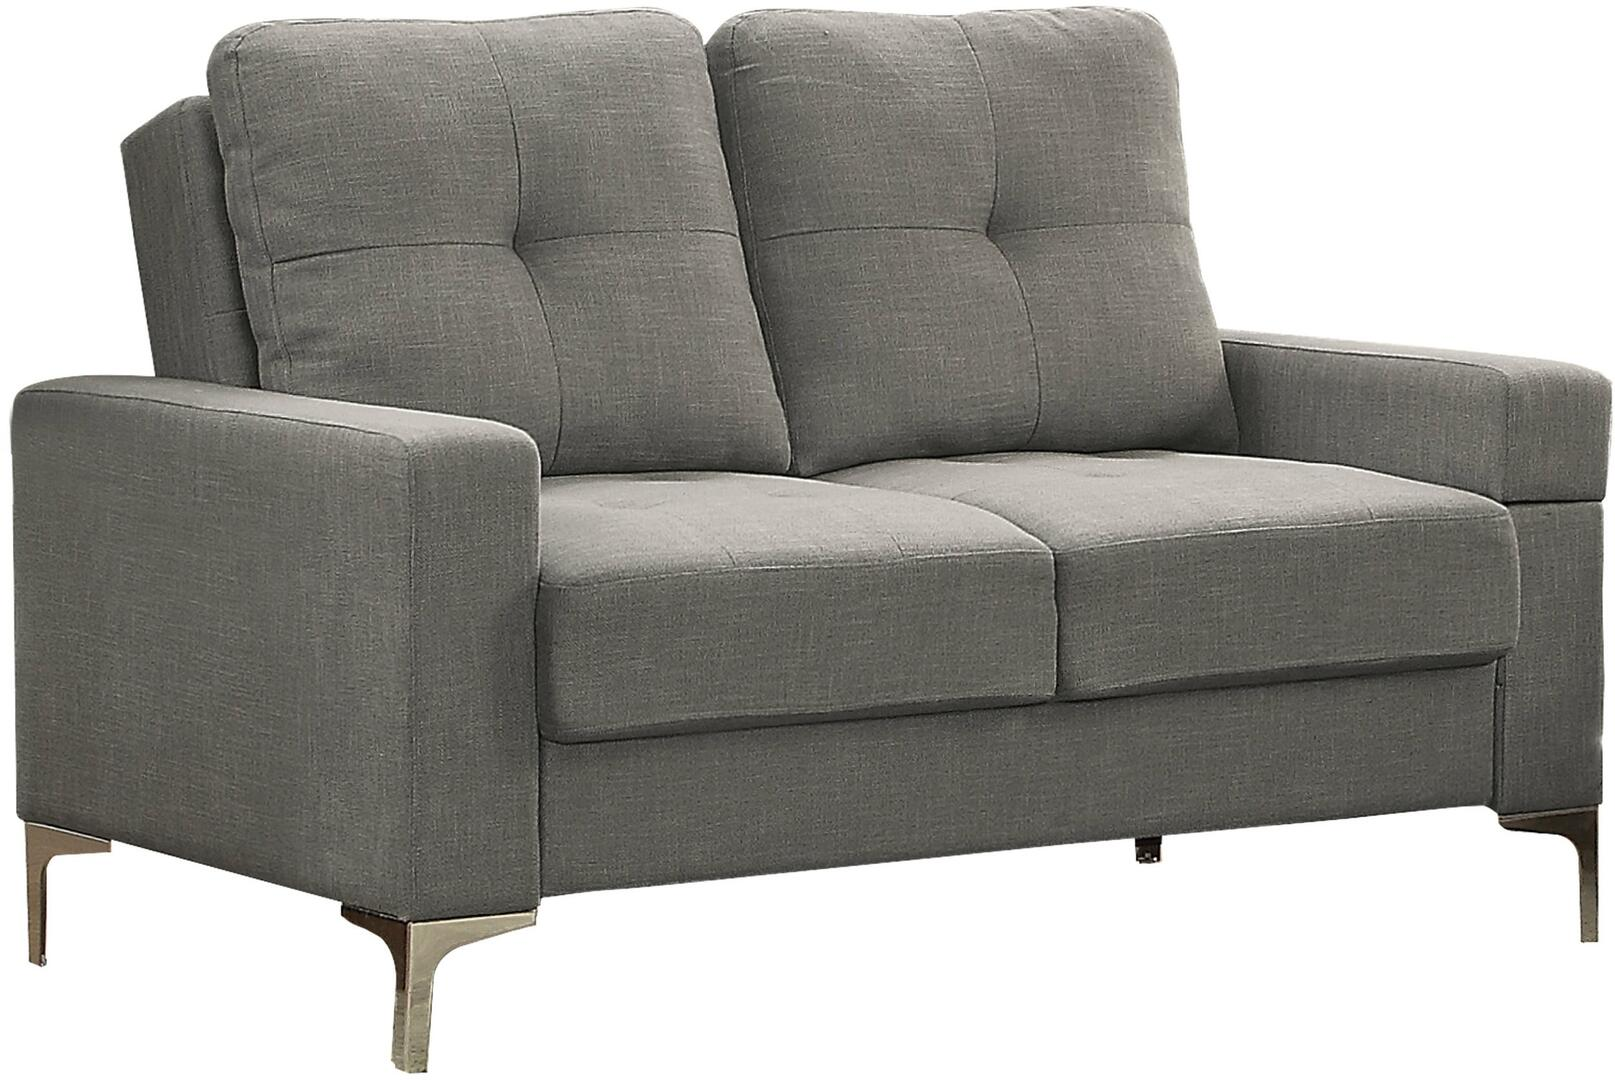 Surprising Acme Furniture 52811 Unemploymentrelief Wooden Chair Designs For Living Room Unemploymentrelieforg